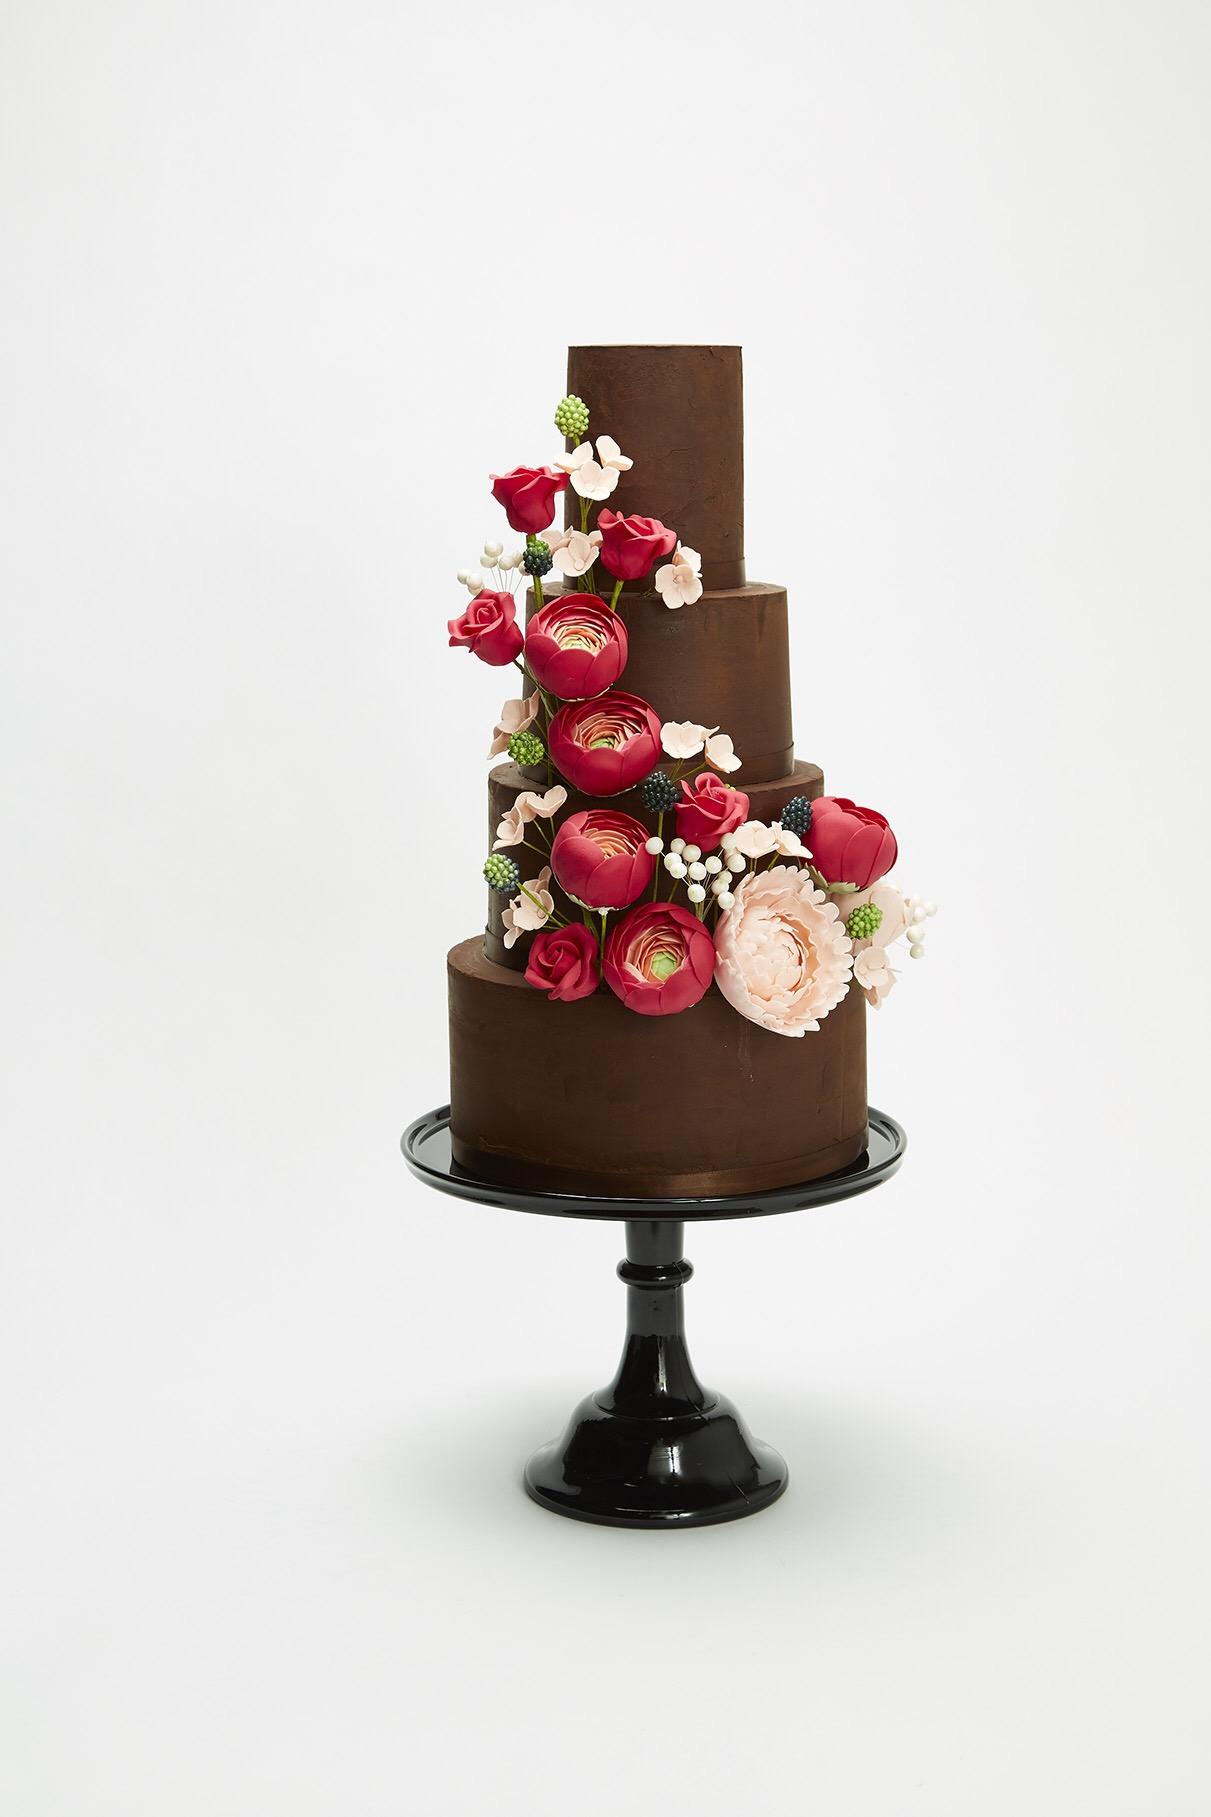 Jess Hill Cakes - Beautiful designer wedding cakes